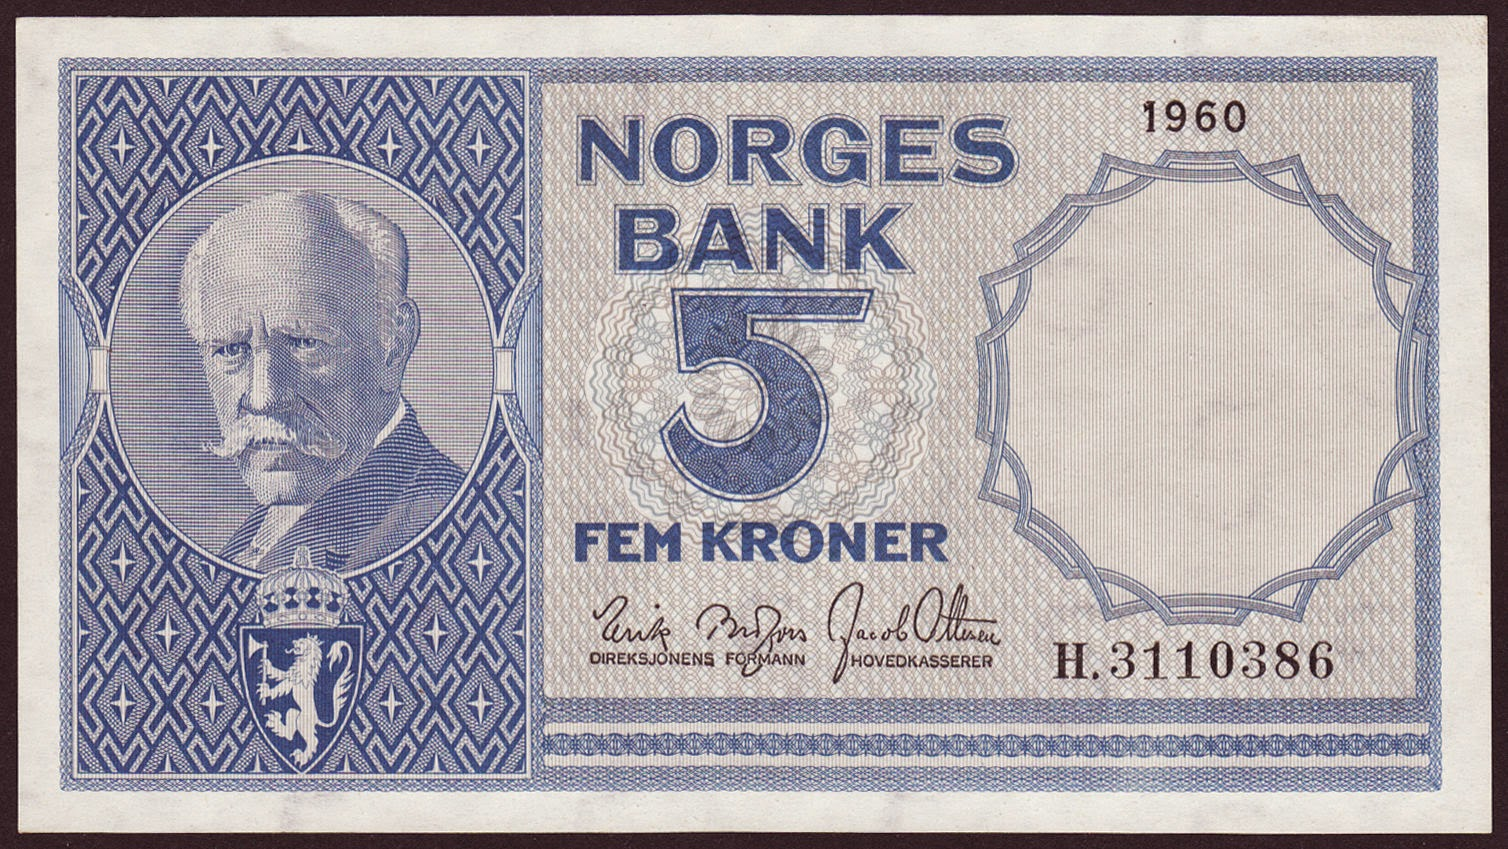 Norway Banknotes 5 Kroner banknote 1960 Fridtjof Nansen